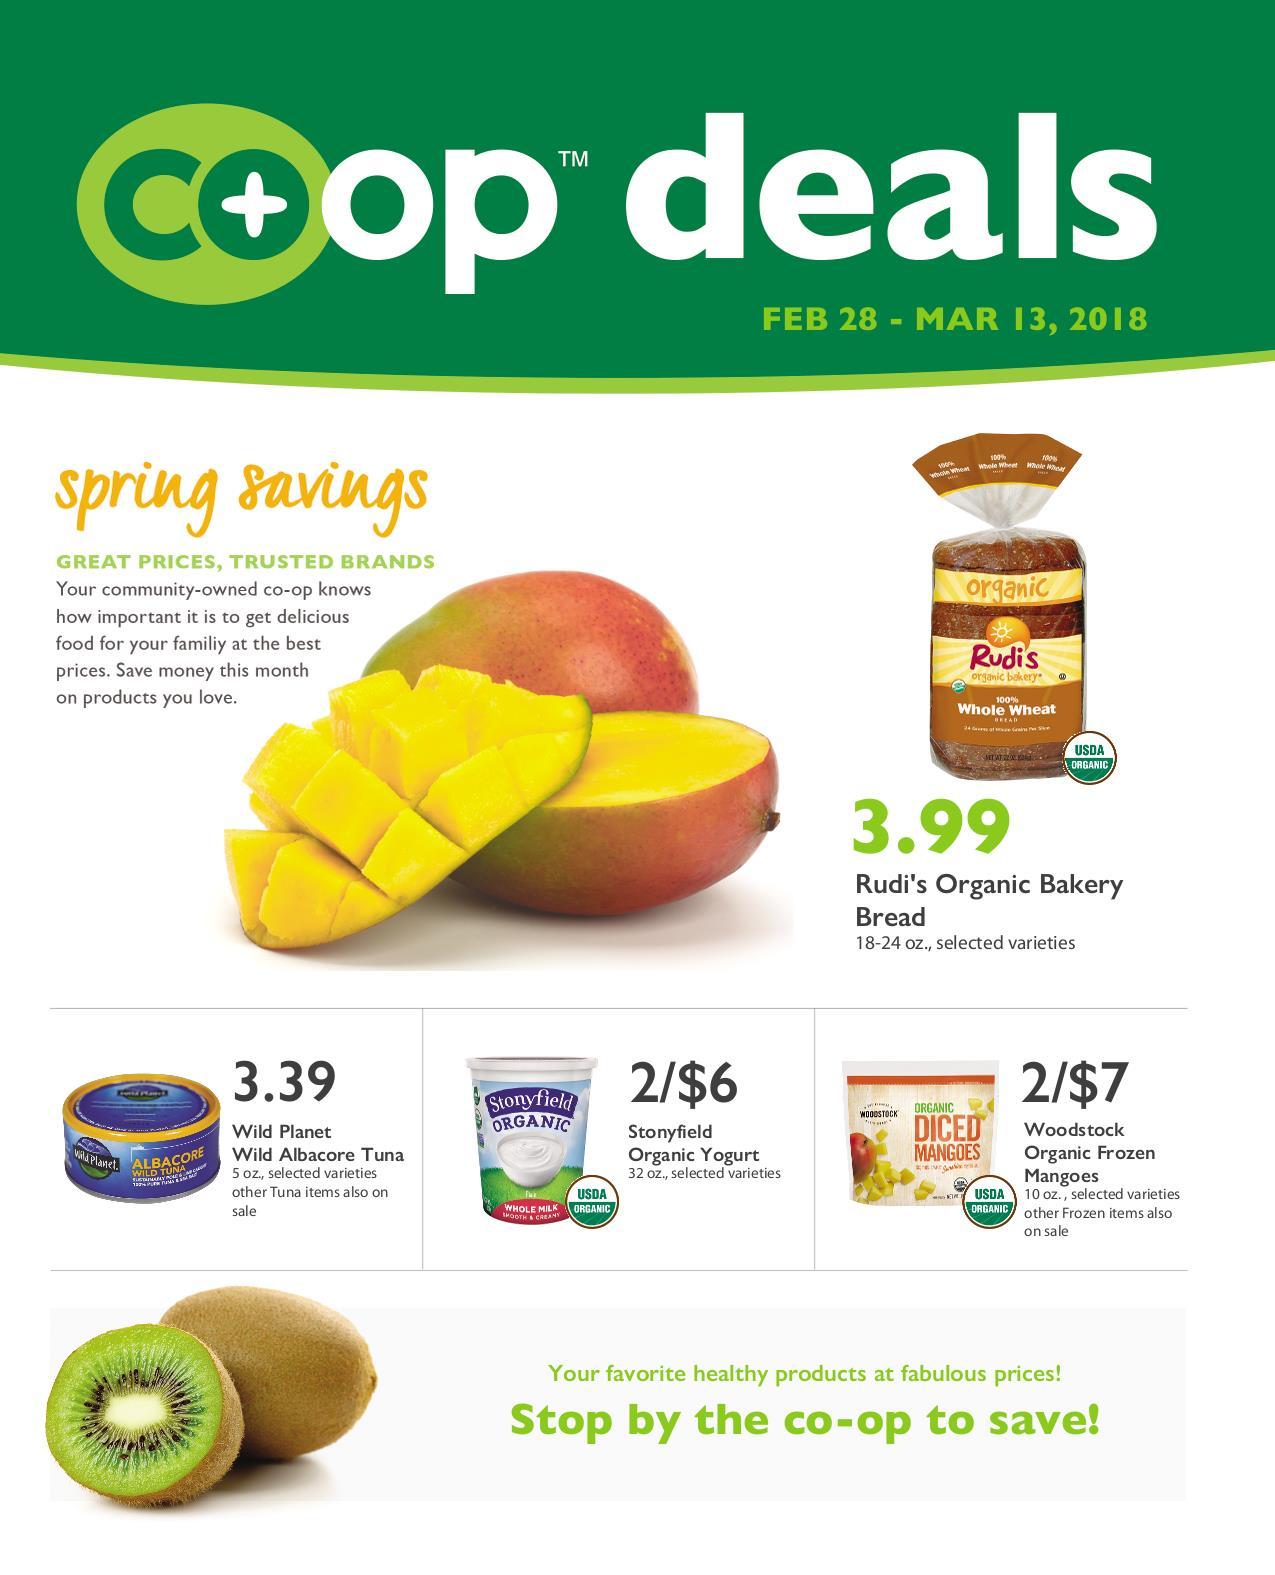 First Alternative Co-op Deals February 28-March 13